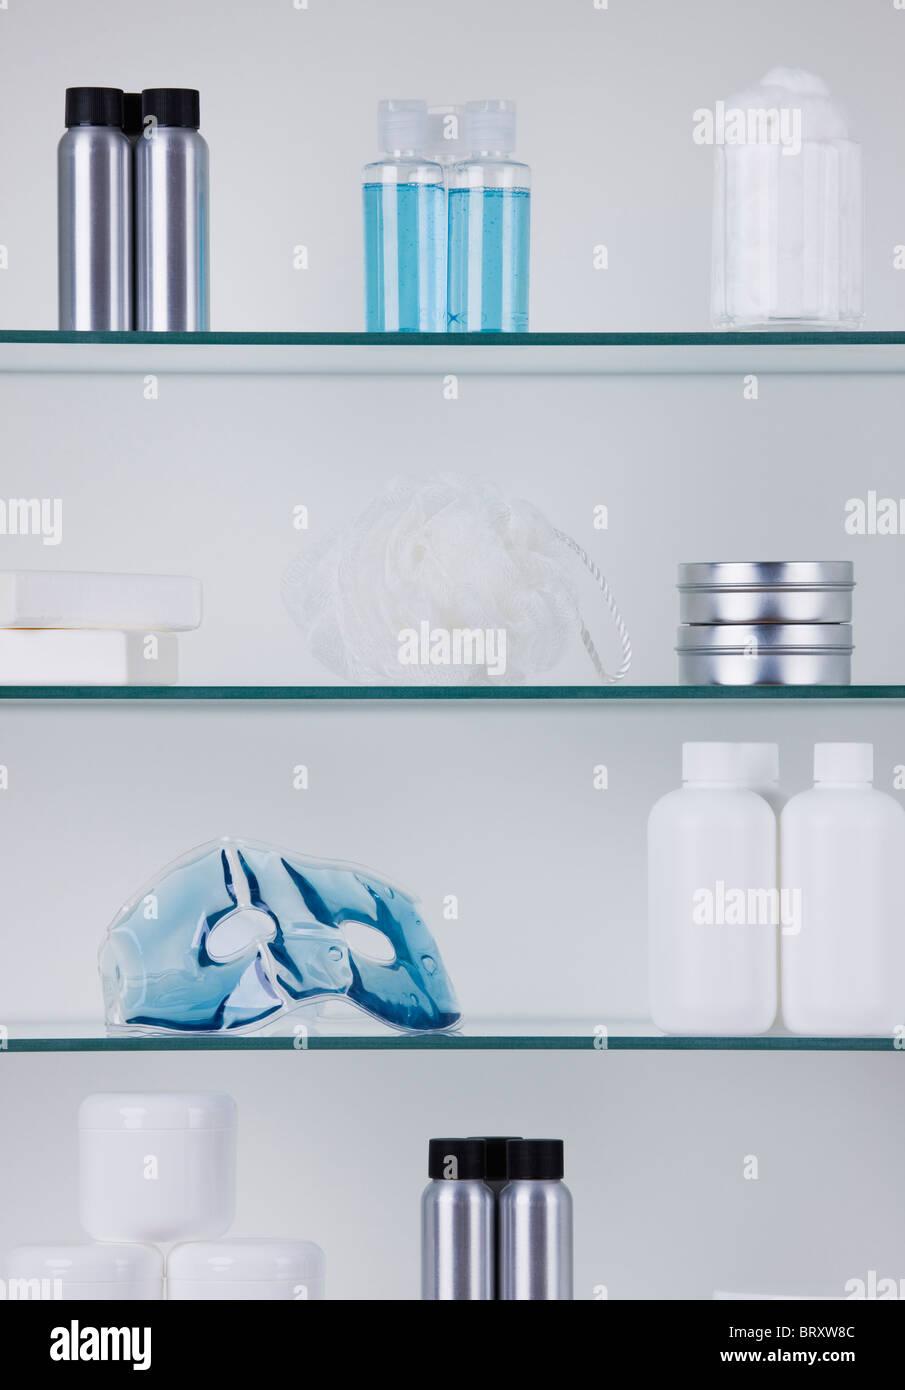 Bathroom Cabinet And Toiletries Stock Photos & Bathroom Cabinet And ...